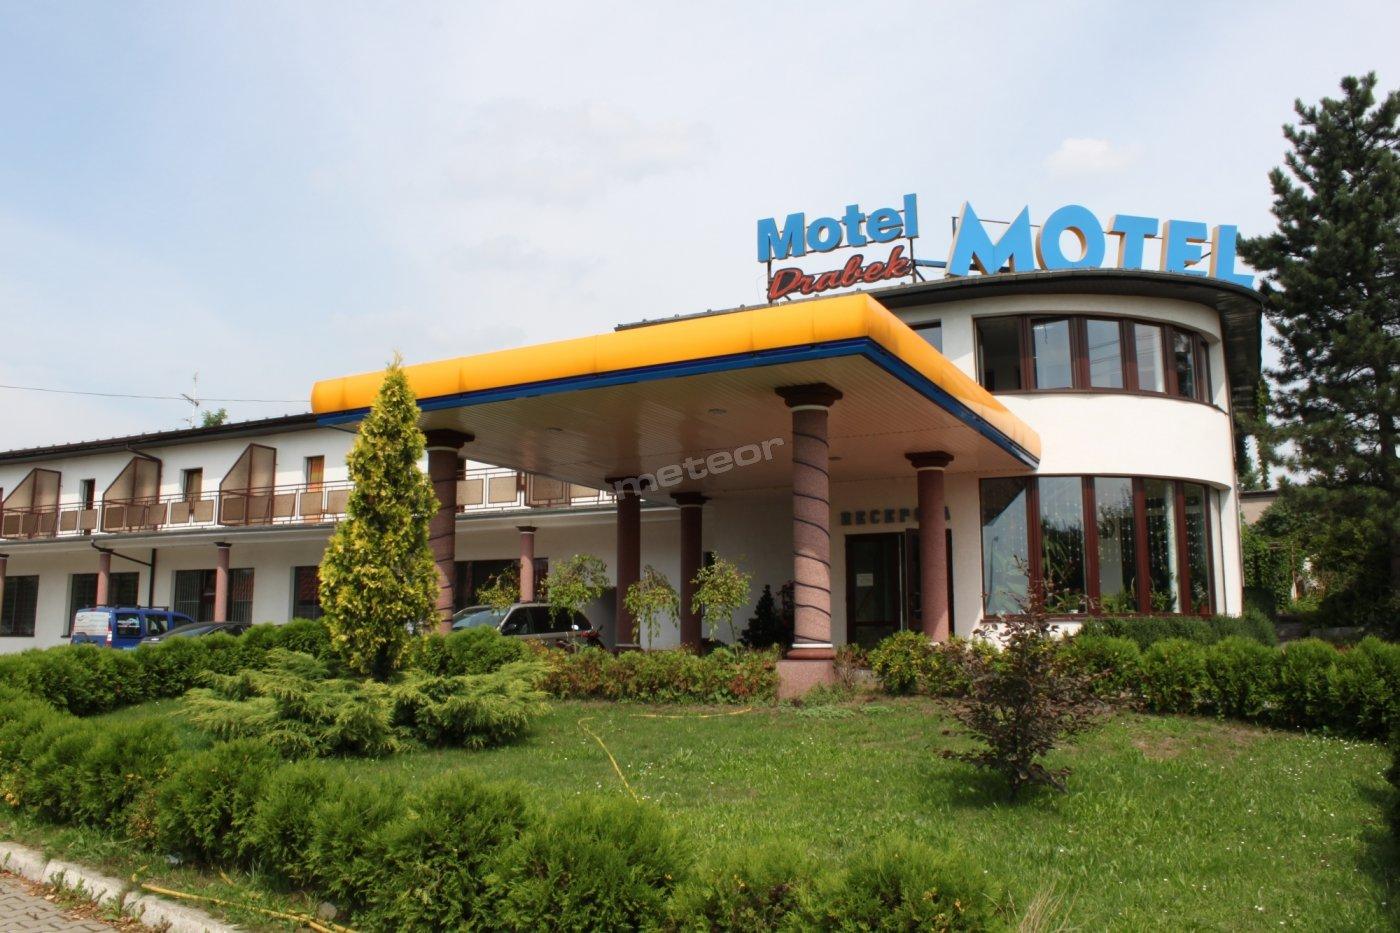 Motel Drabek